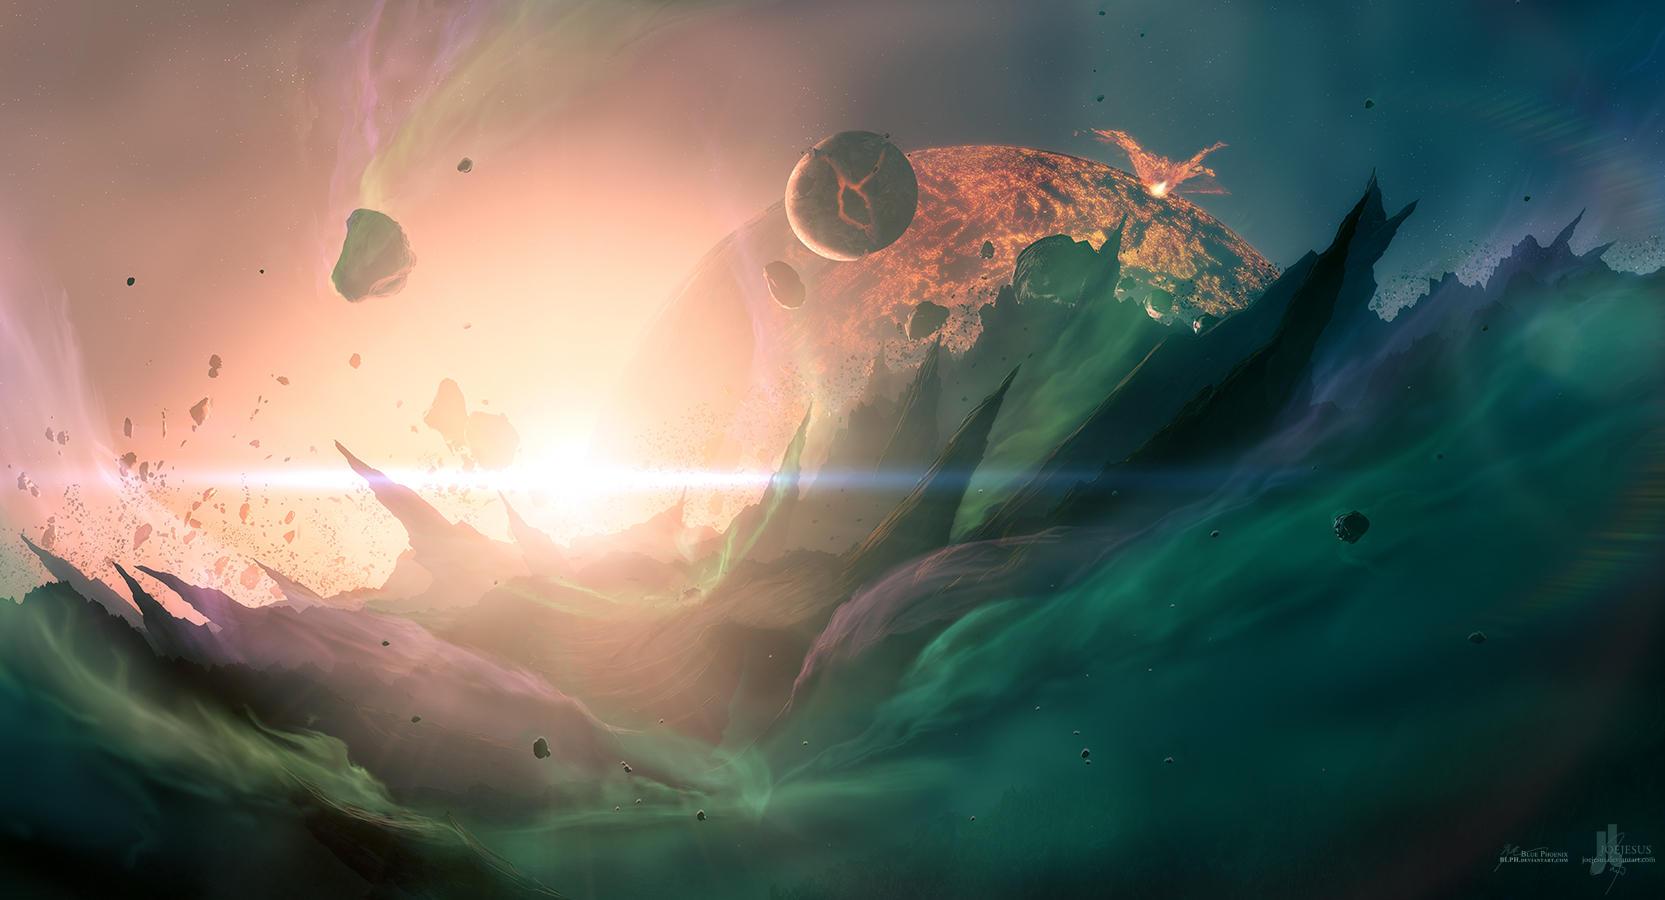 Into Oblivion by JoeyJazz